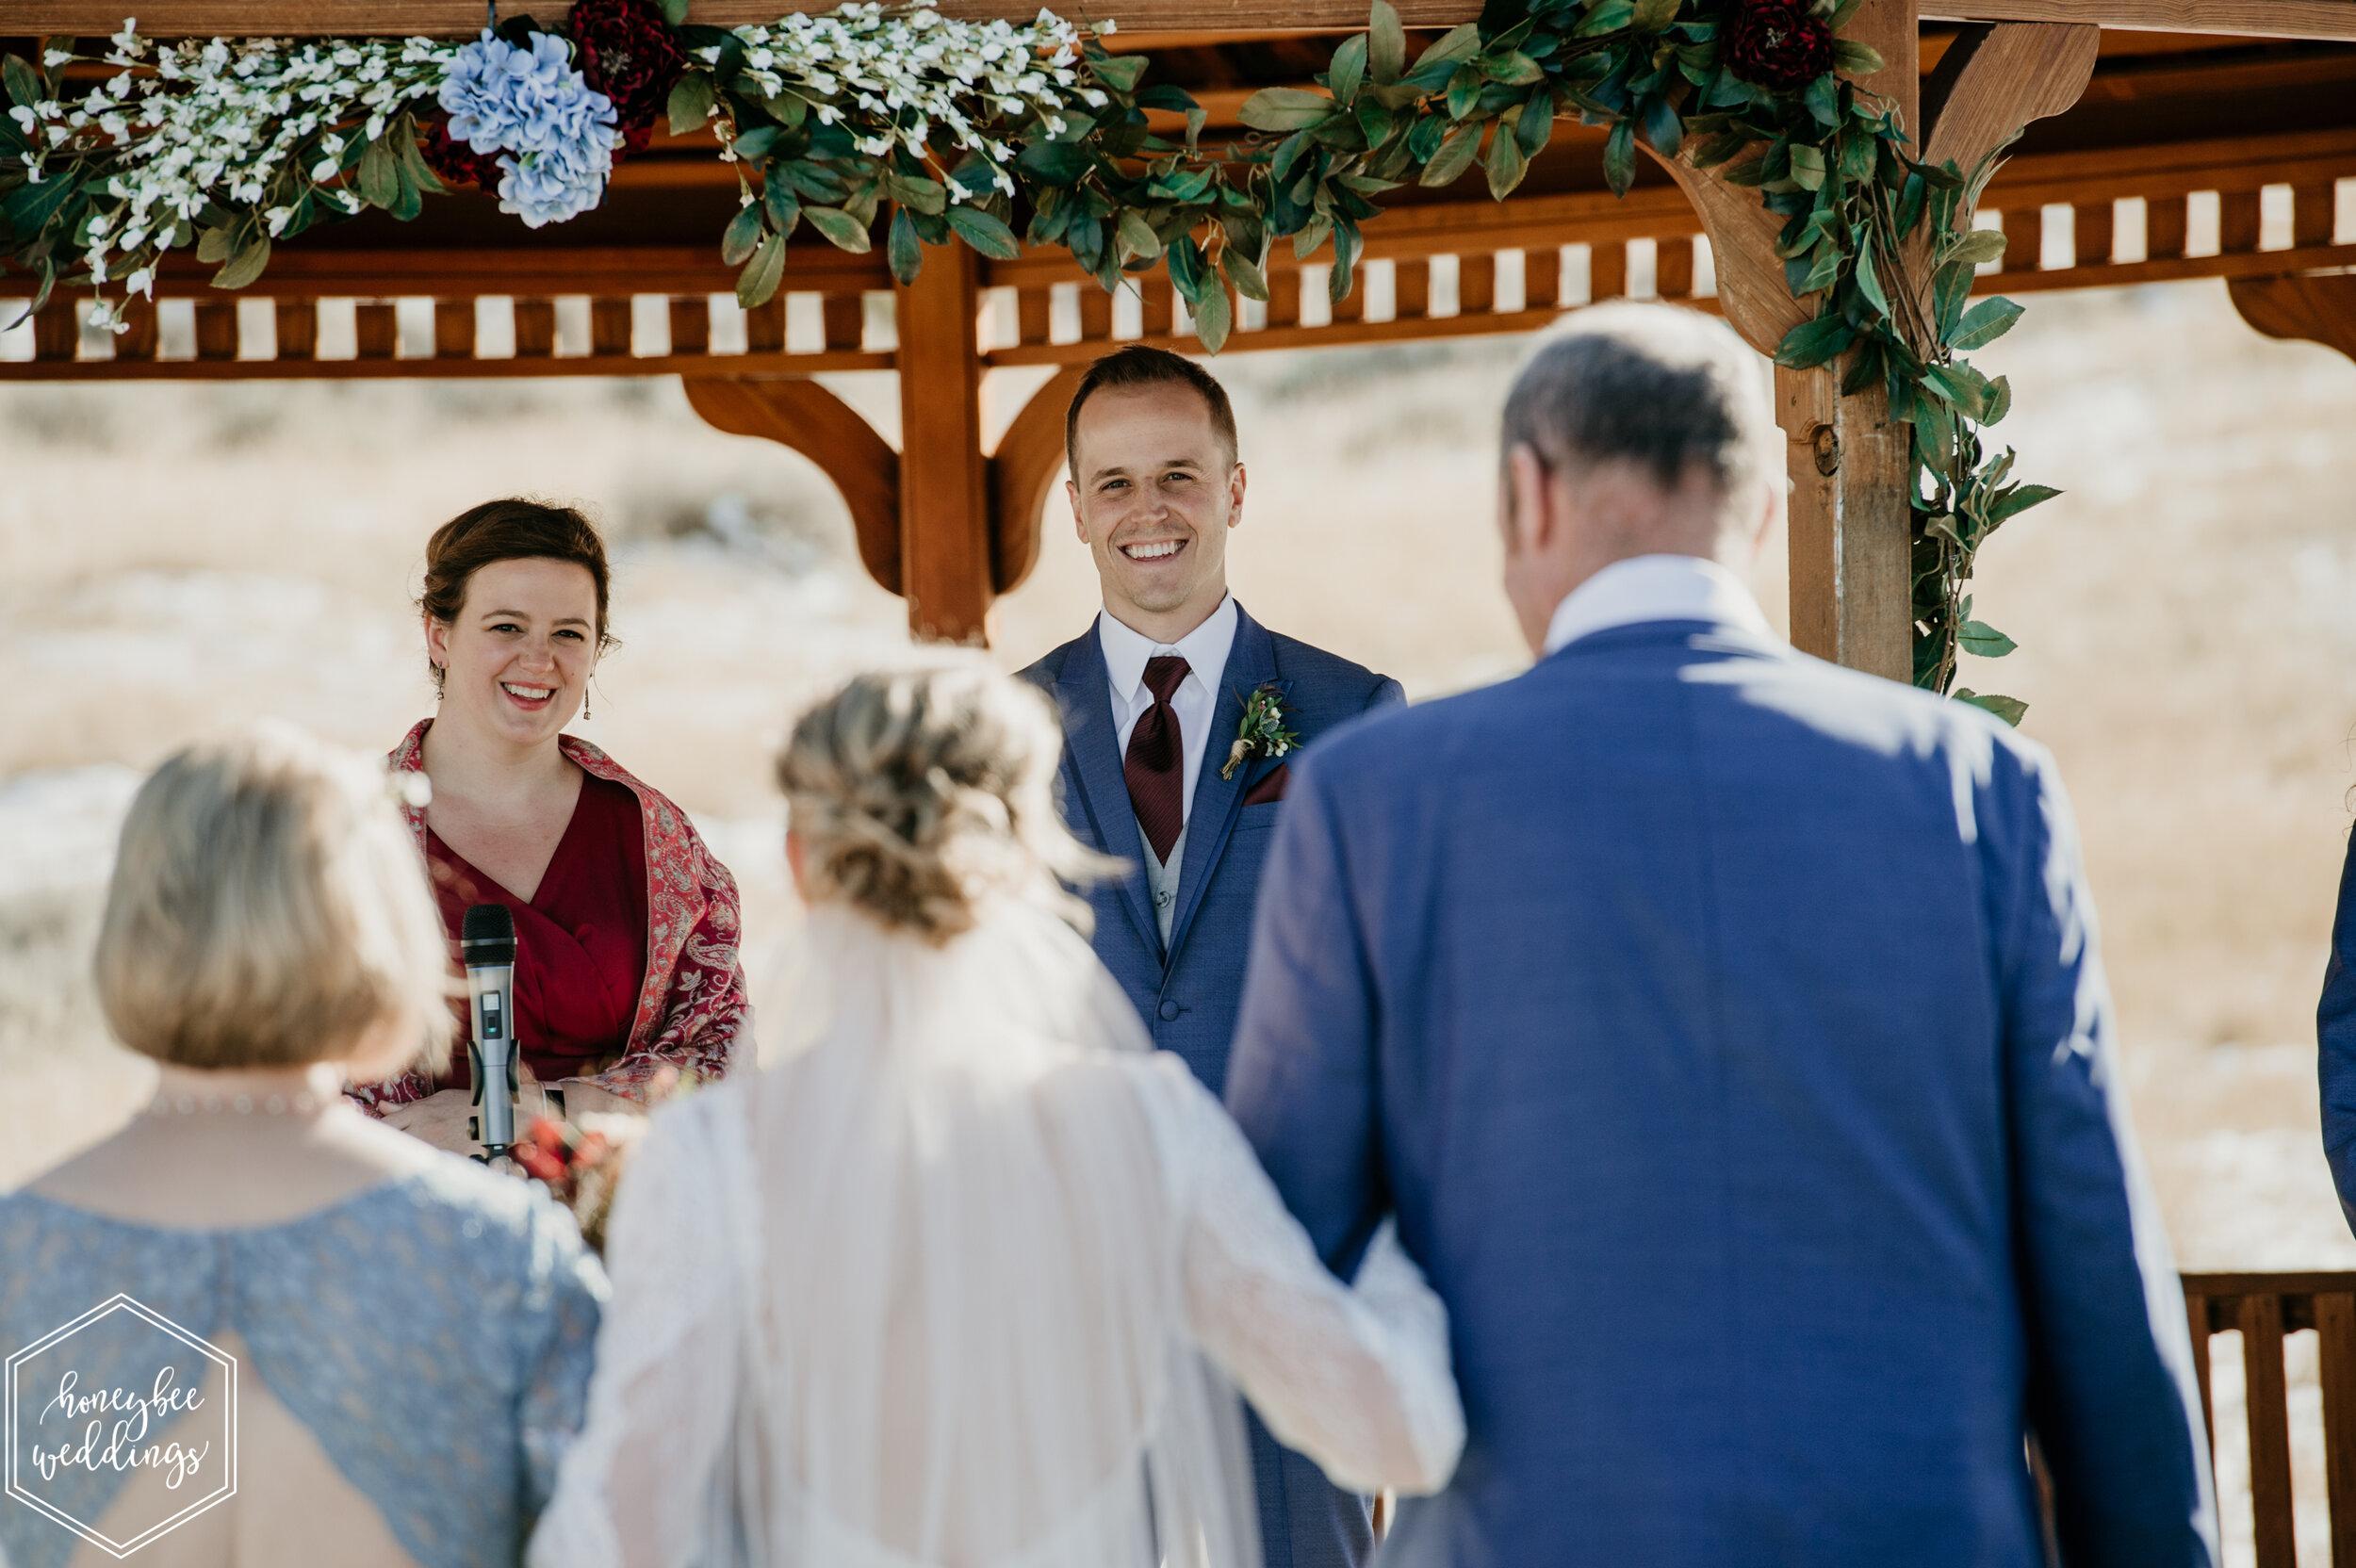 124Chico Hot Springs Wedding_Montana Wedding Photographer_Winter Wedding_Ariel & Richard_October 12, 2019-2272.jpg